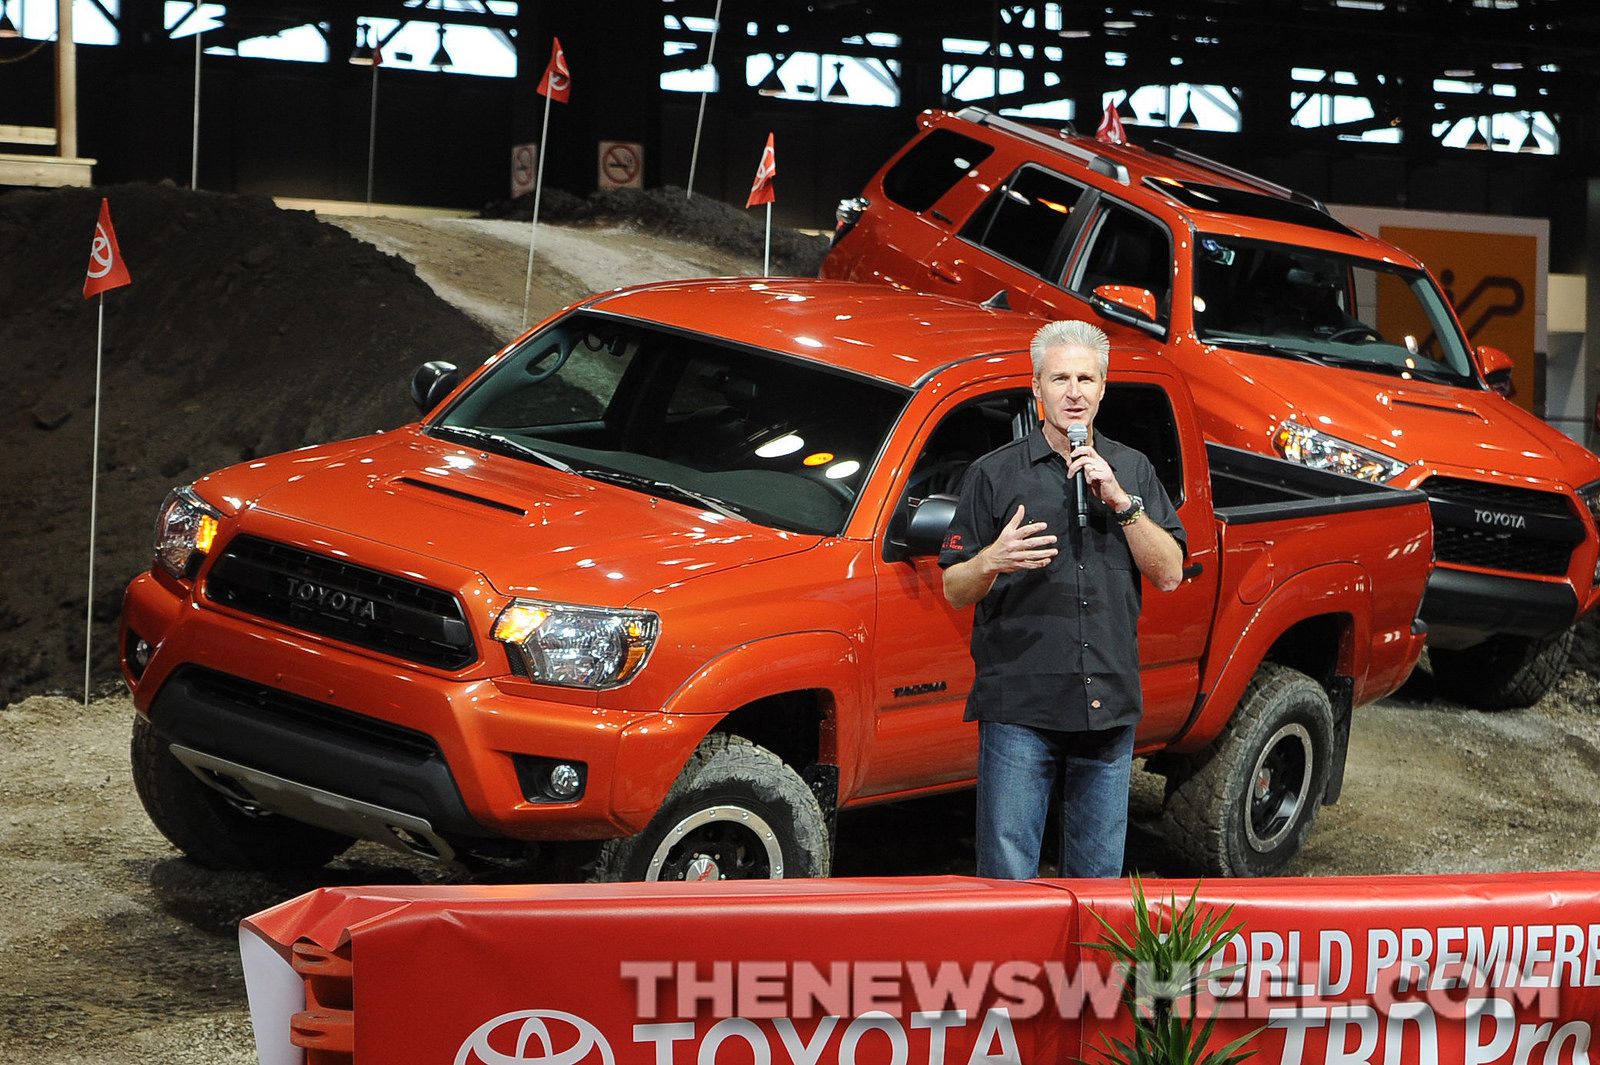 TRD Pro Series Trucks